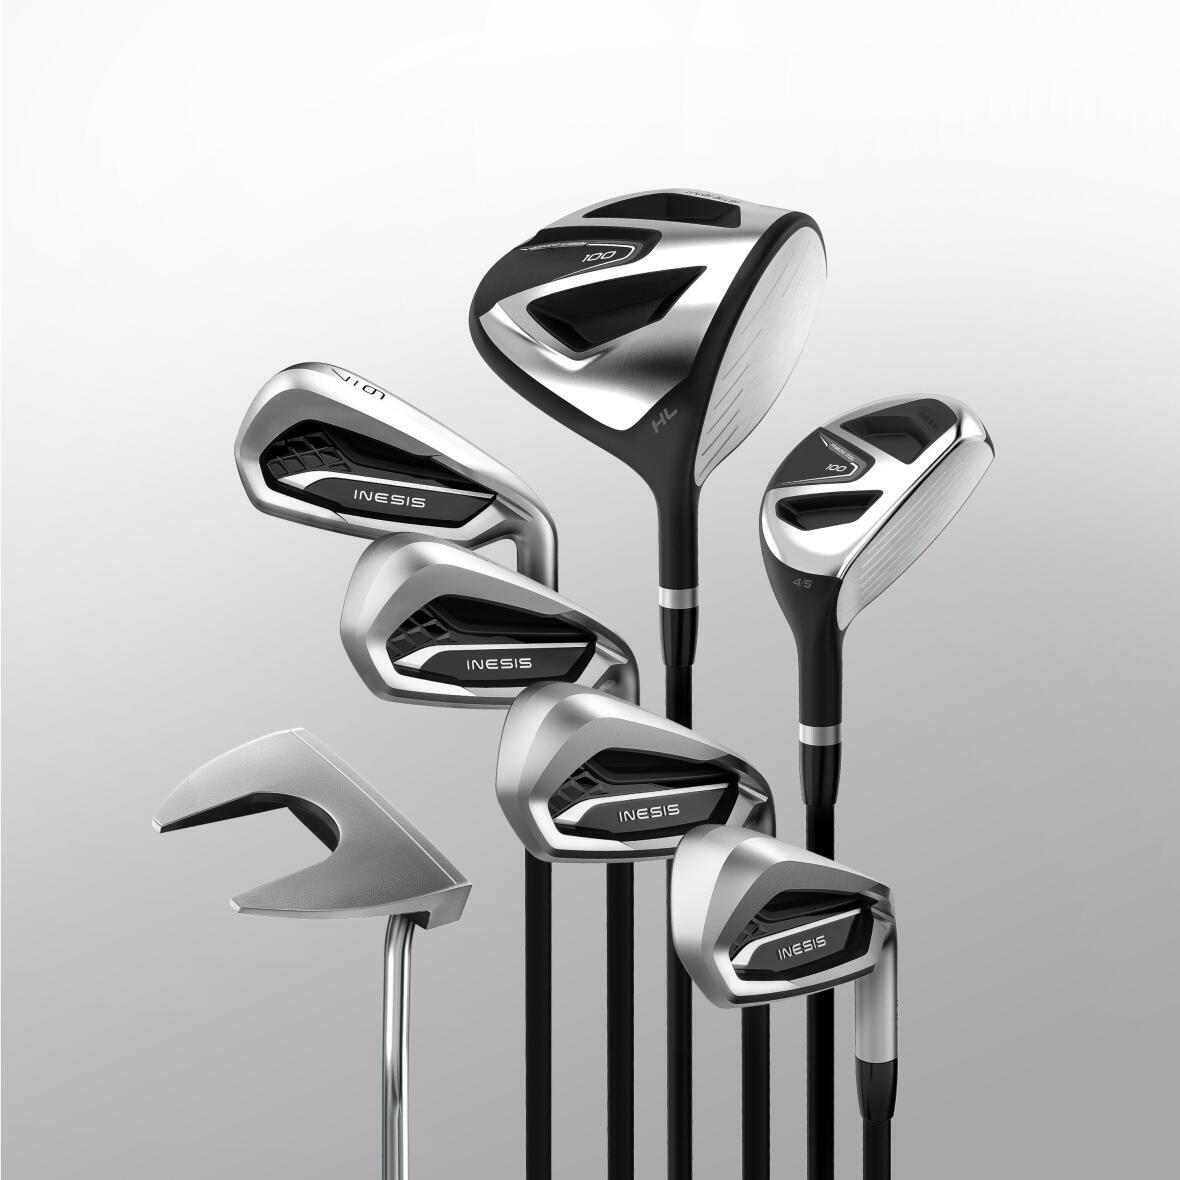 A set of golf clubs for beginner